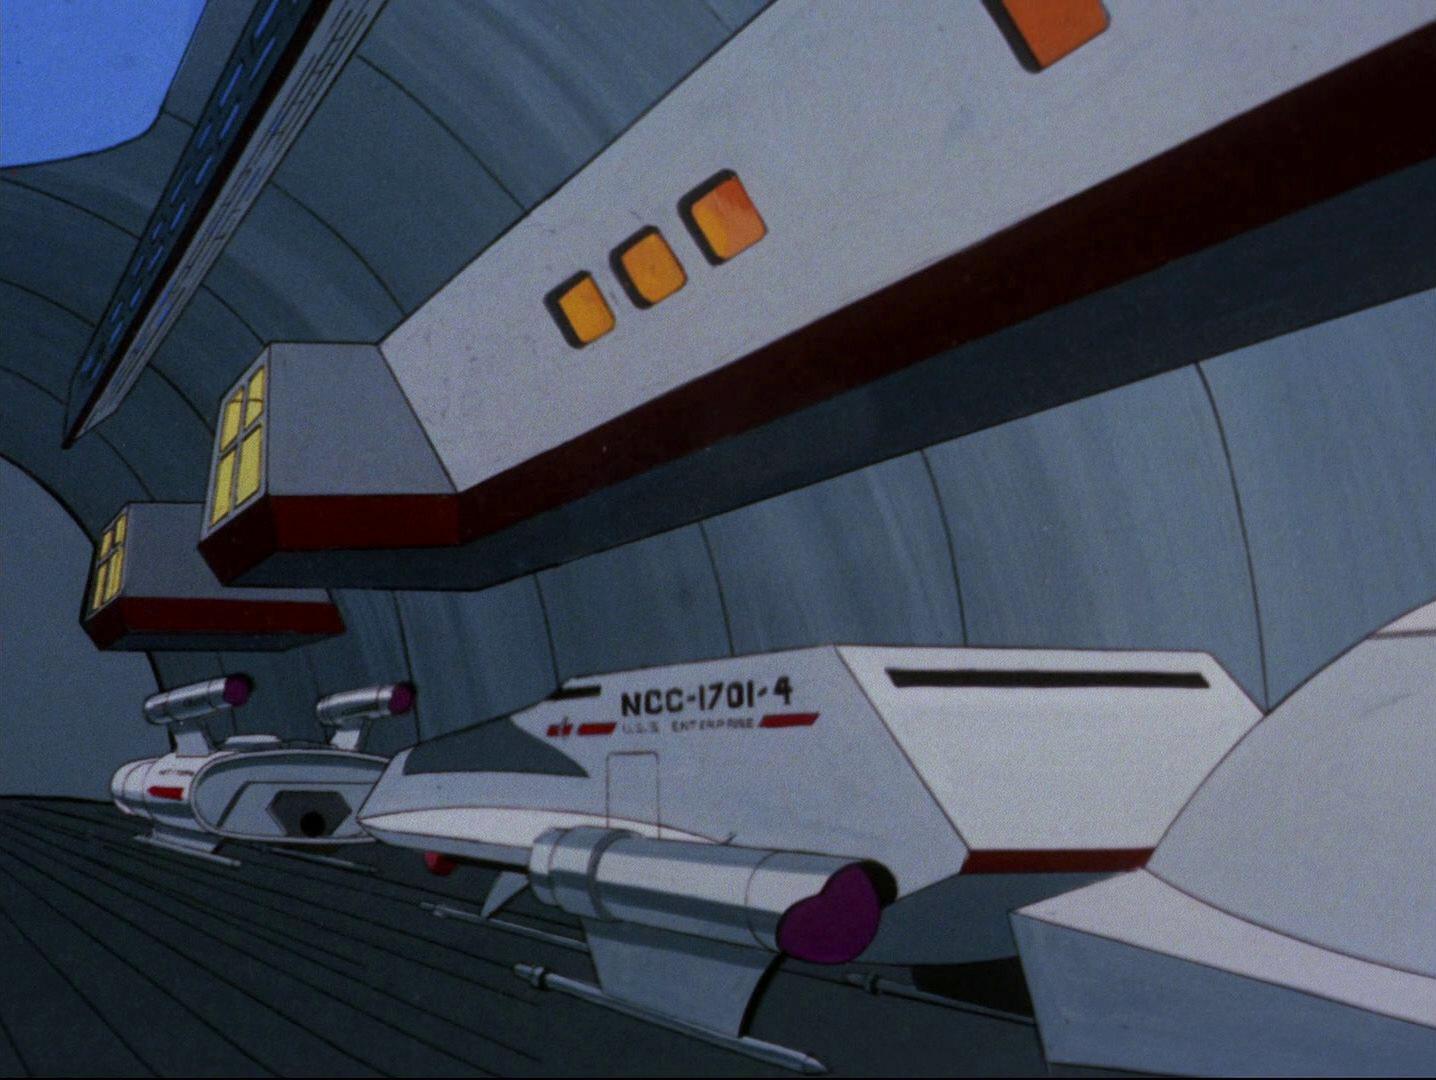 Ex Astris Scientia - TAS Starfleet & Federation Ship Classes